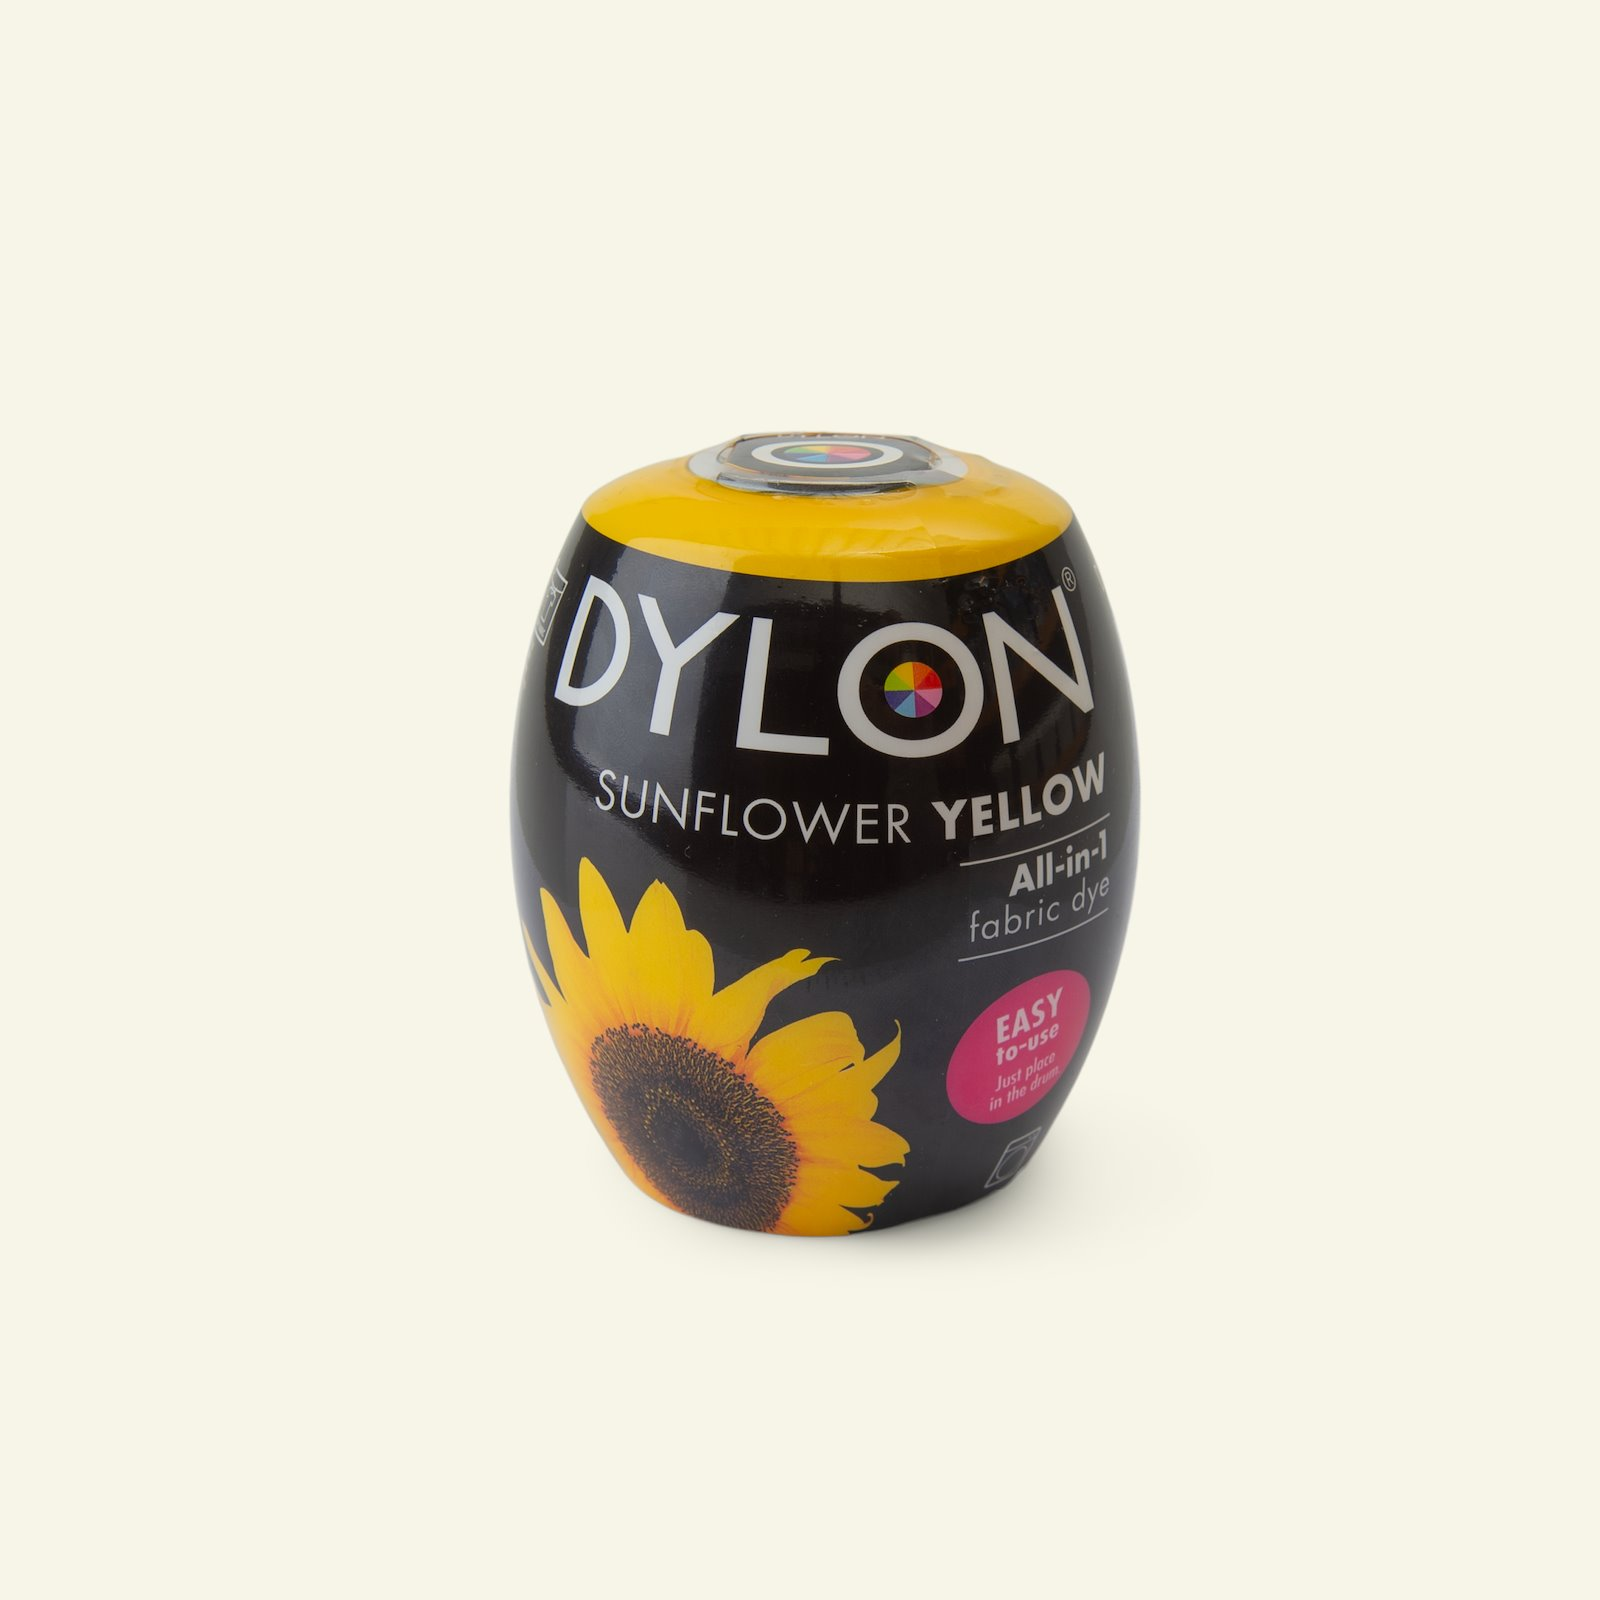 Dylon fabric dye for machine yellow 29701_pack_b